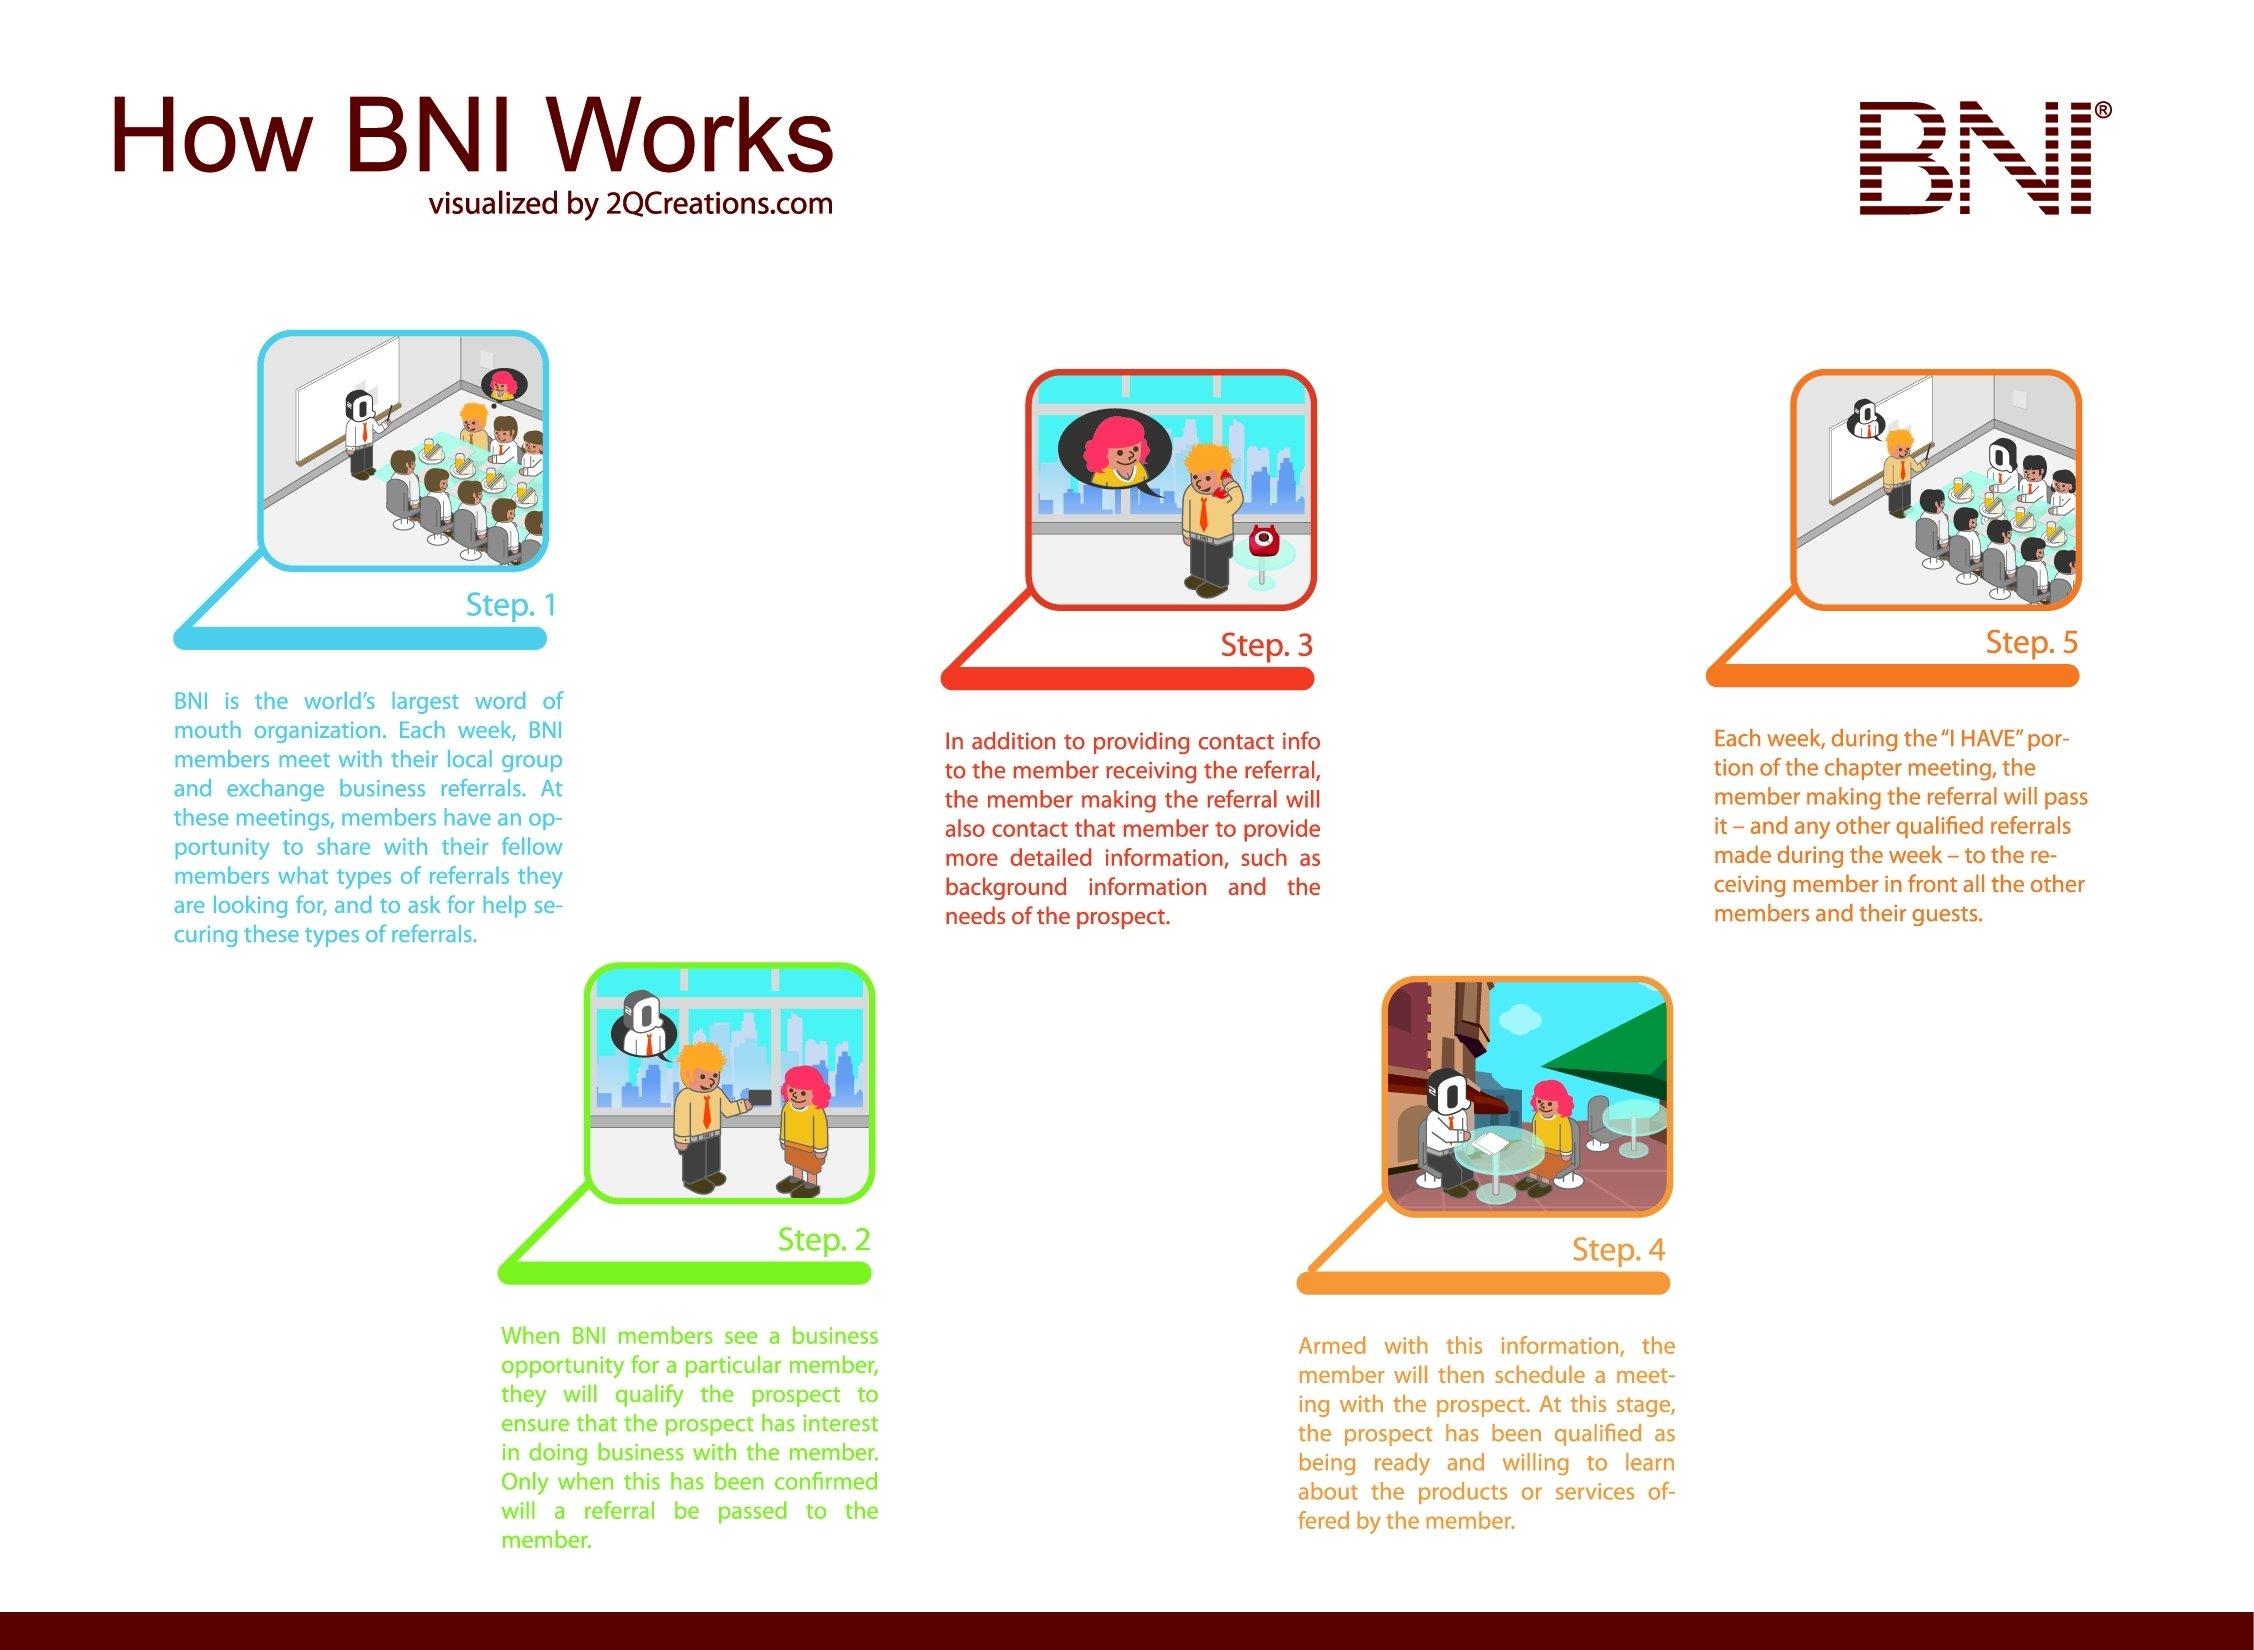 10 Fantastic Bni 10 Minute Presentation Ideas how bni works infographic bni houston west region pinterest 2020